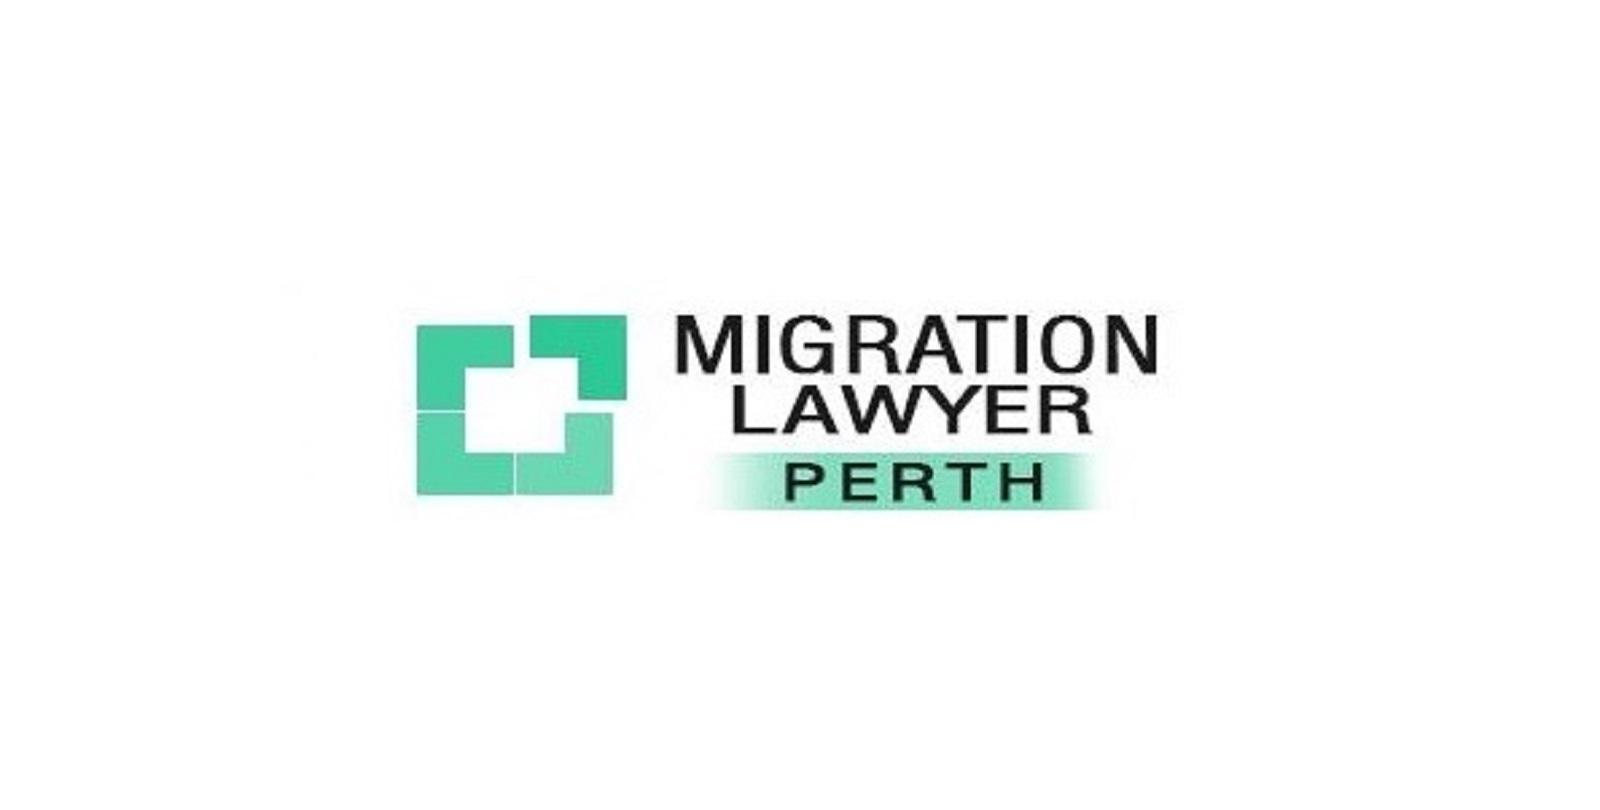 Migration Lawyer Perth WA Logo